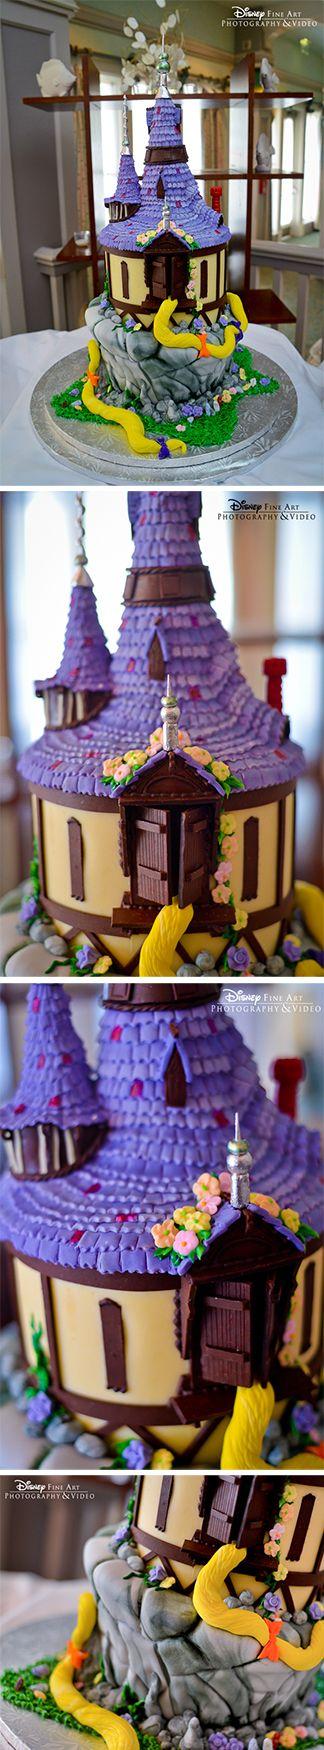 Rapunzel-inspired, Disney Tangled wedding cake